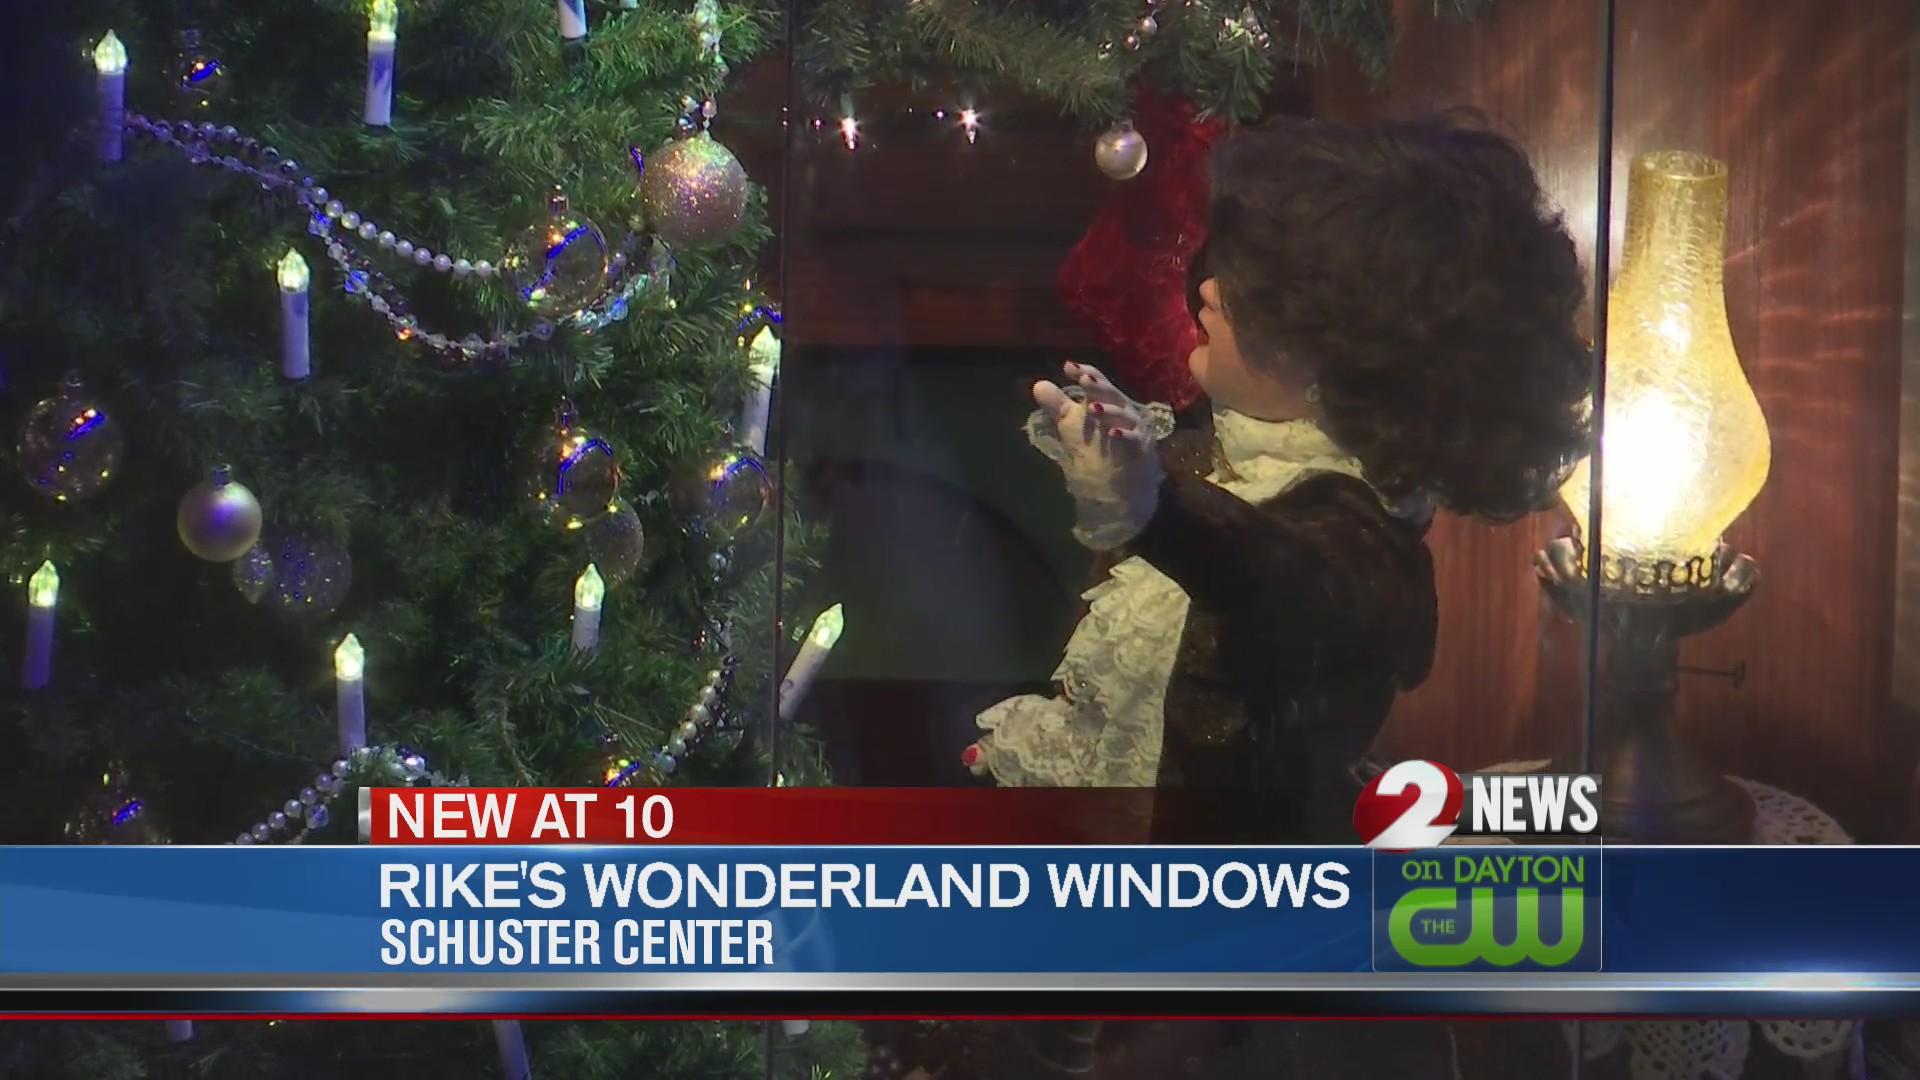 Rike's Wonderland Windows